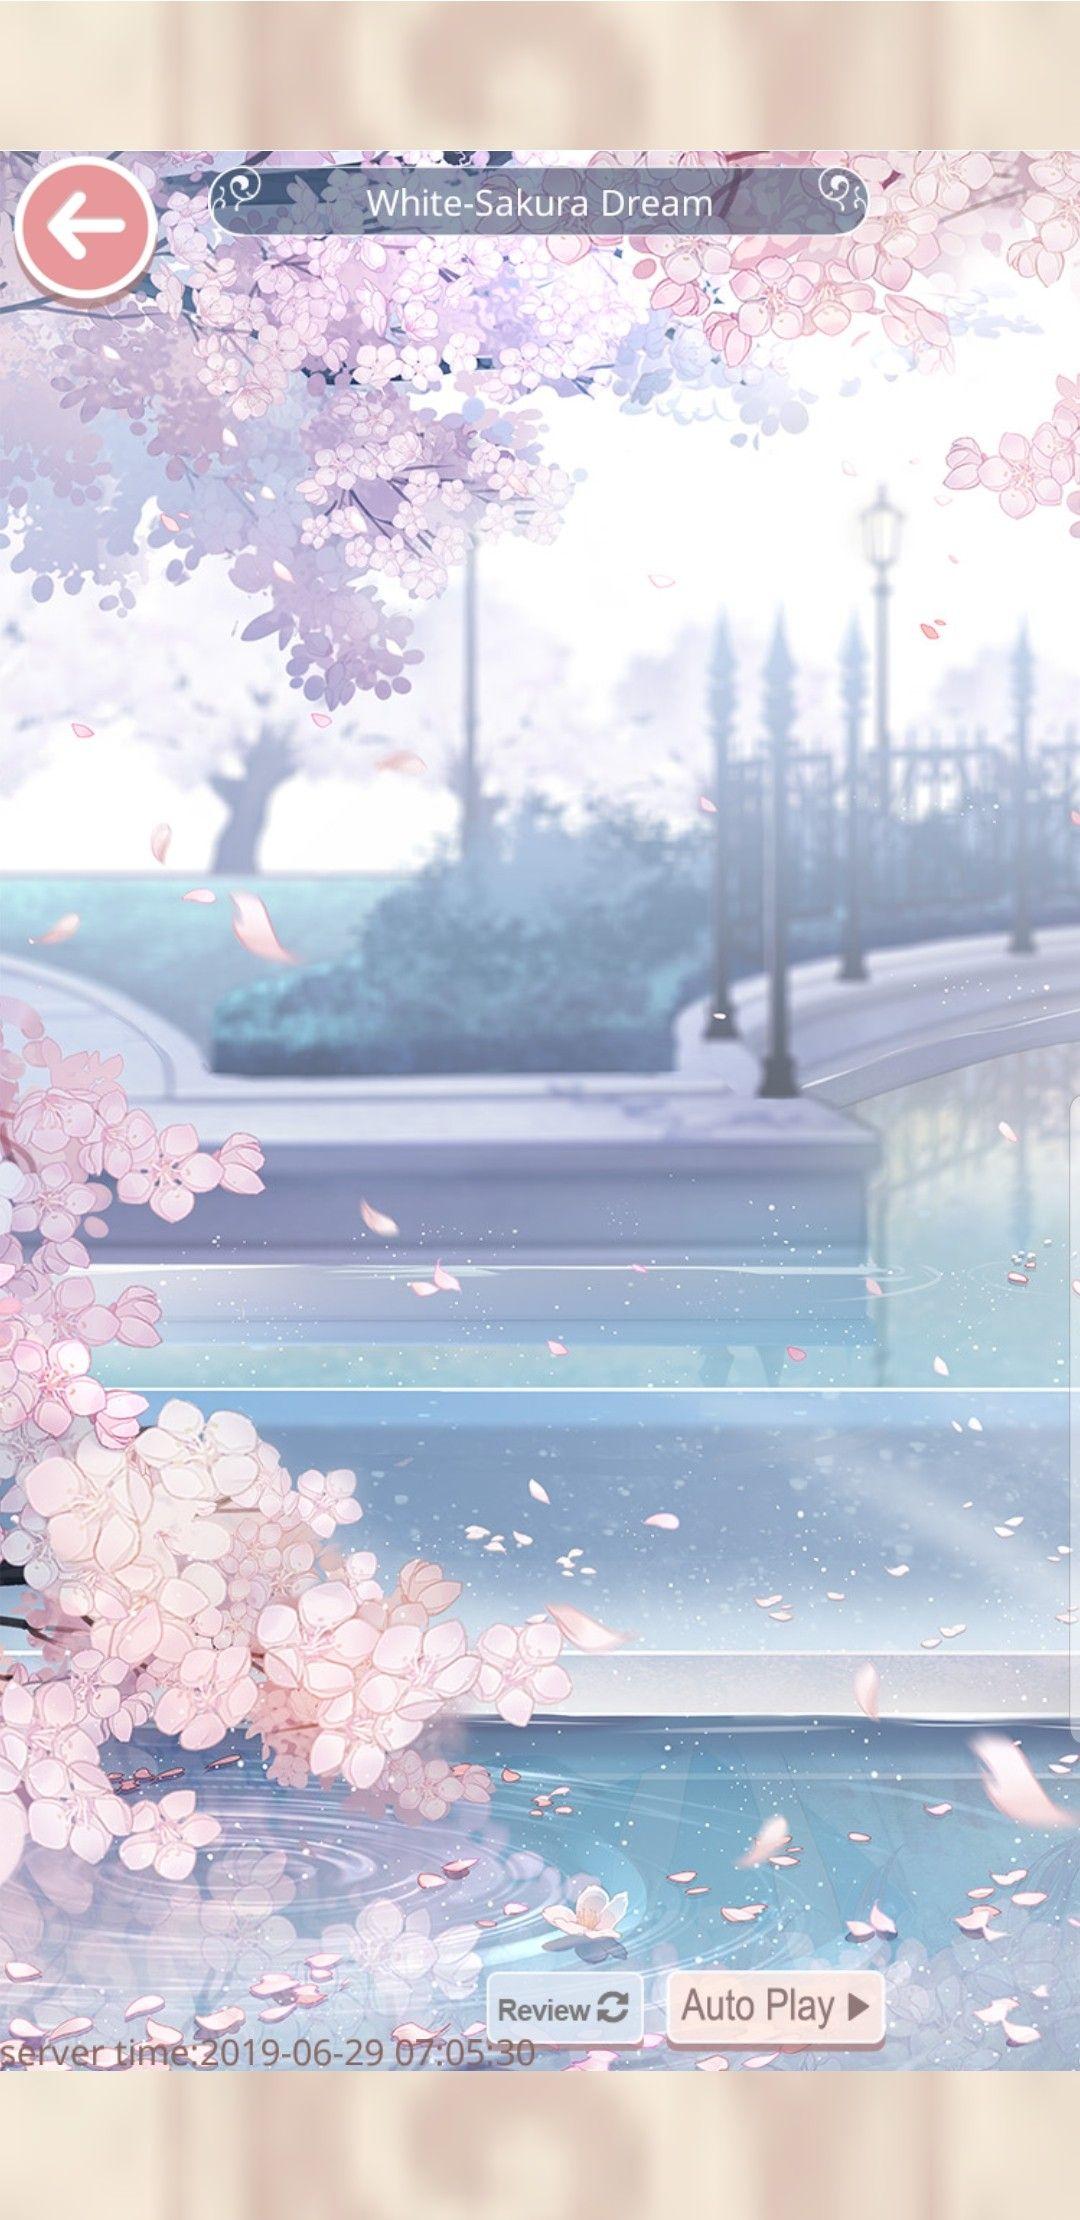 Shining Nikki Love Nikki Dress Up Queen 360mobi Miracle Nikki Love Nikki ミラクルニキ 奇迹暖暖 Ngoi Sao Anime Wallpaper Anime Art Anime Background